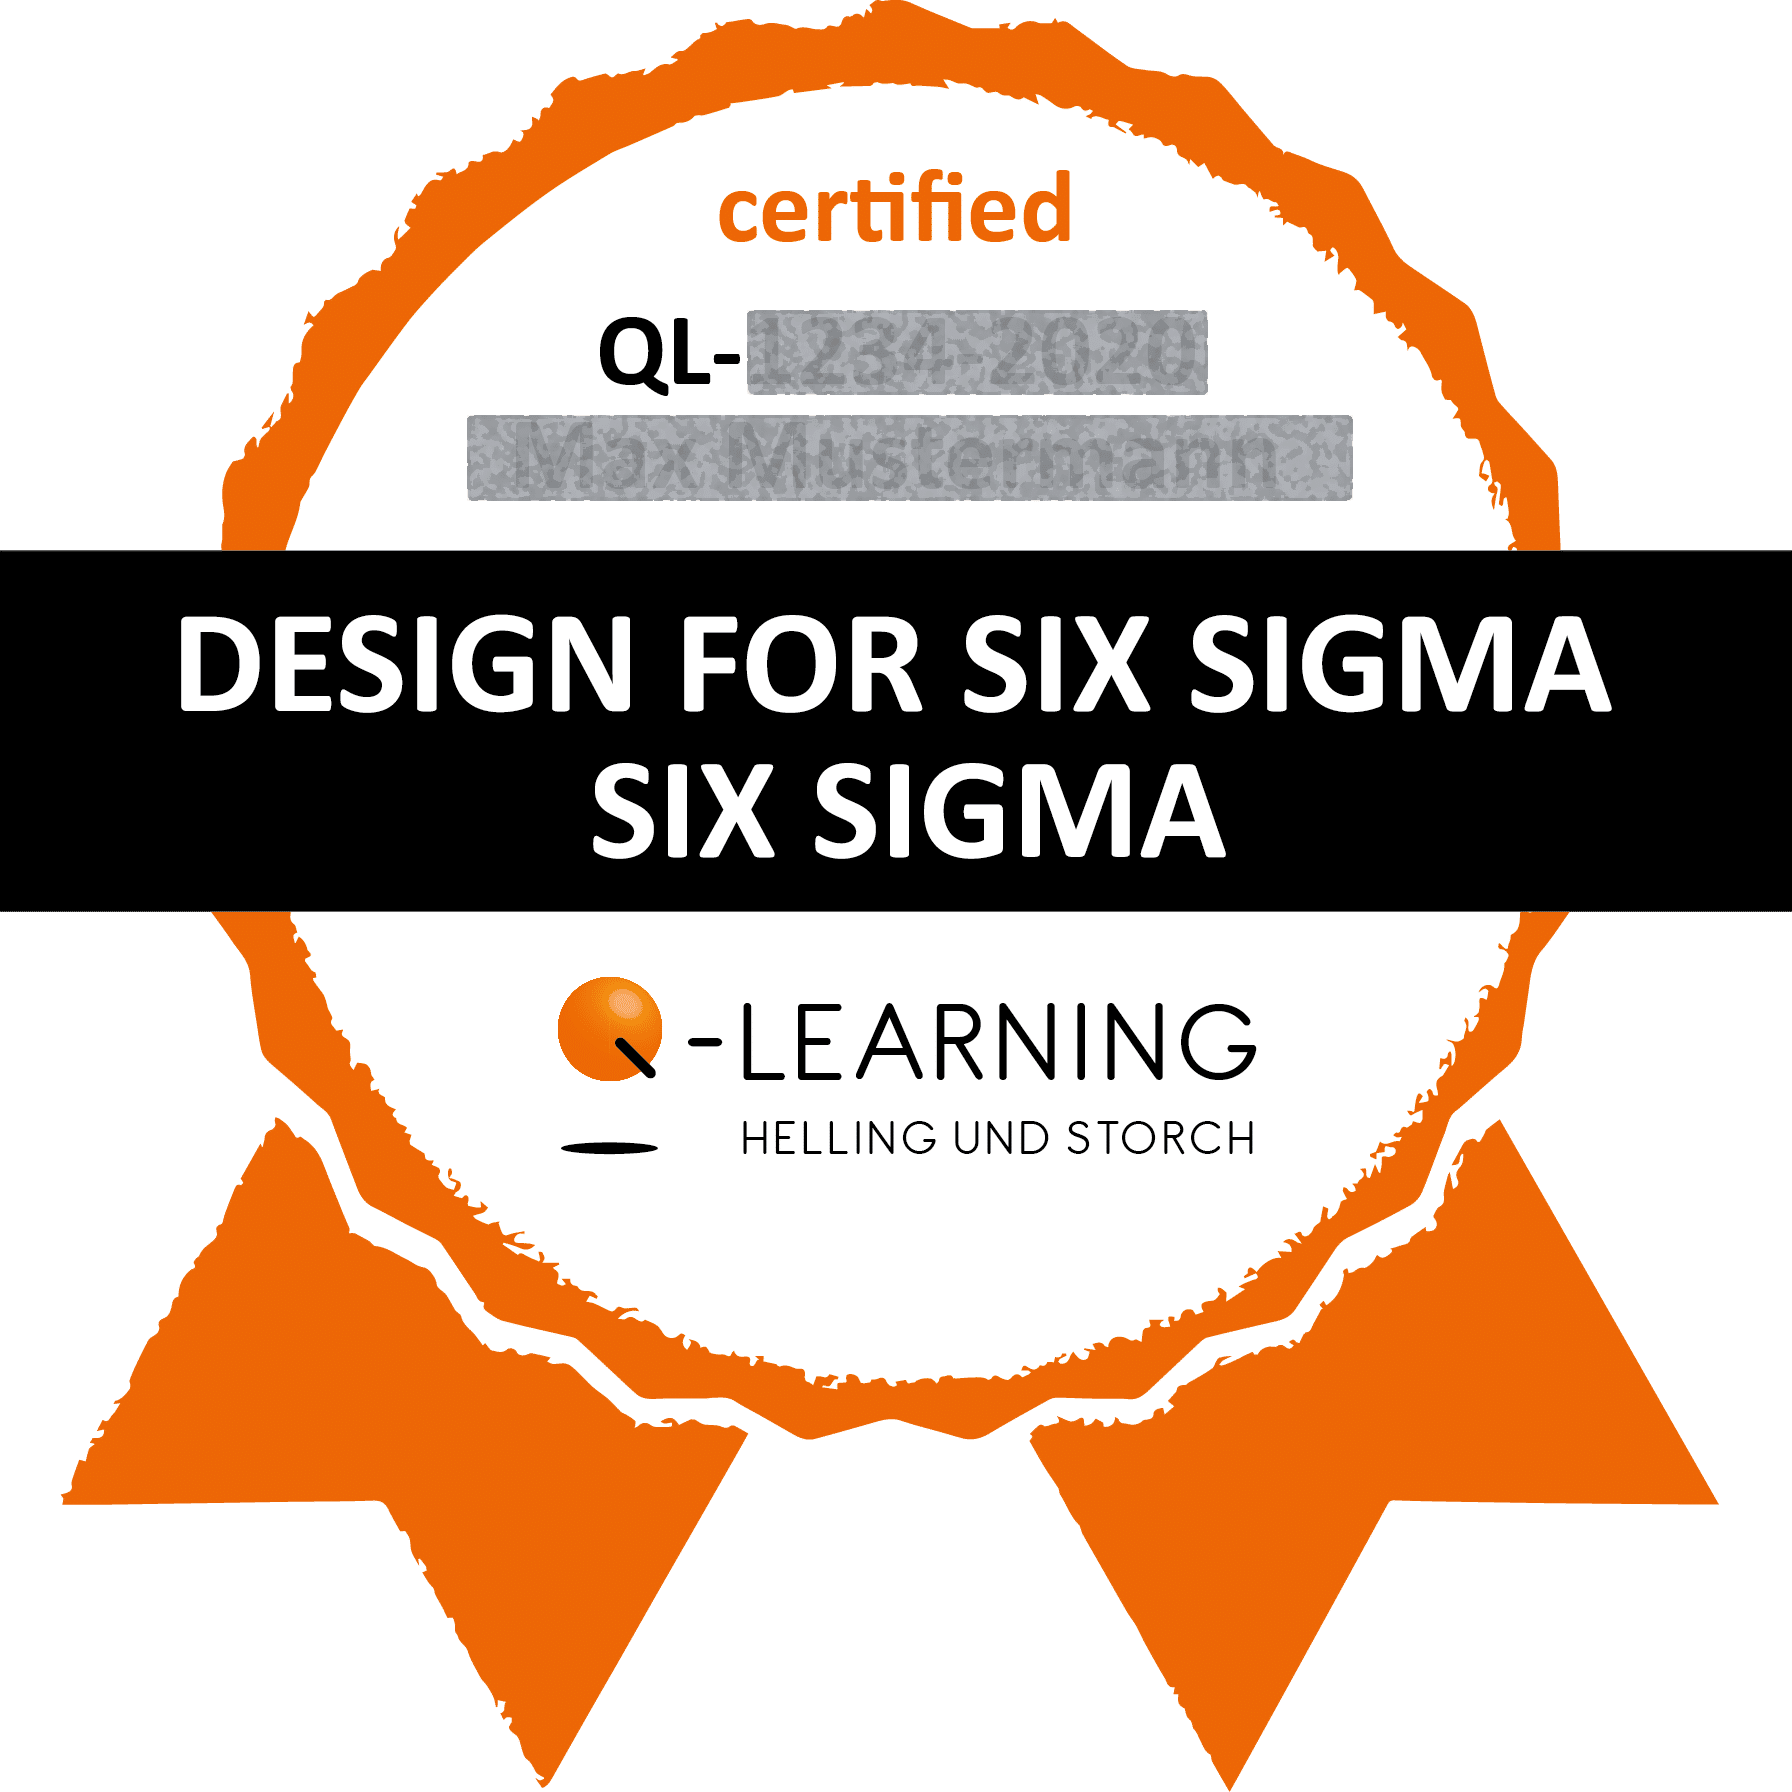 Q-LEARNING Badge Siegel DESIGN FOR SIX SIGMA Webdemo